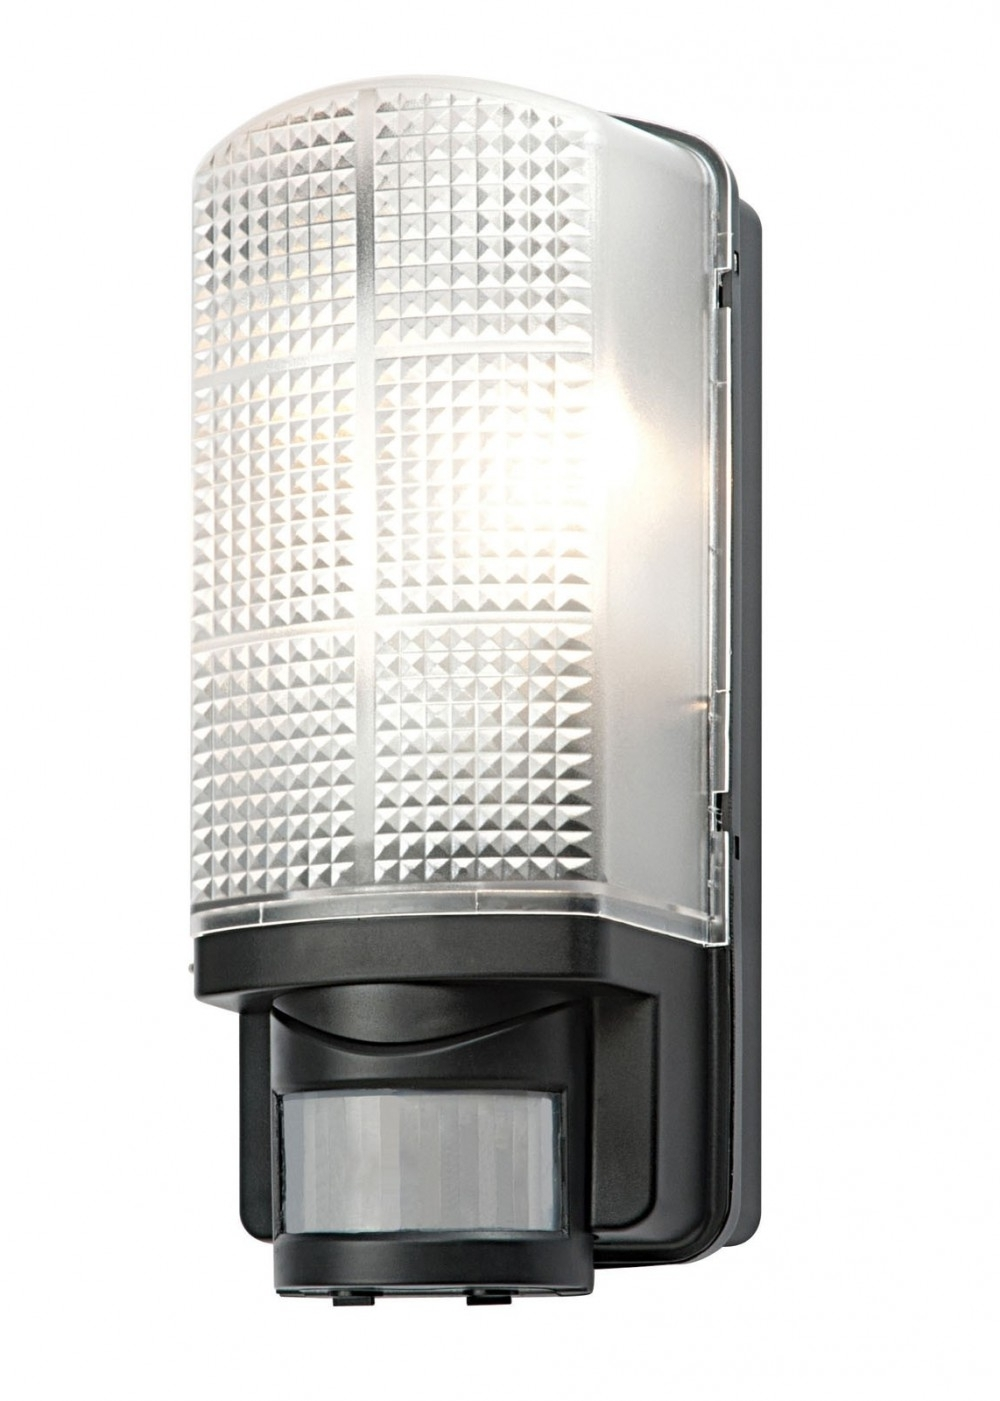 Pir Sensor Outdoor Wall Lighting With Regard To 2018 Safety With Motion Sensor Outdoor Wall Light (View 13 of 20)